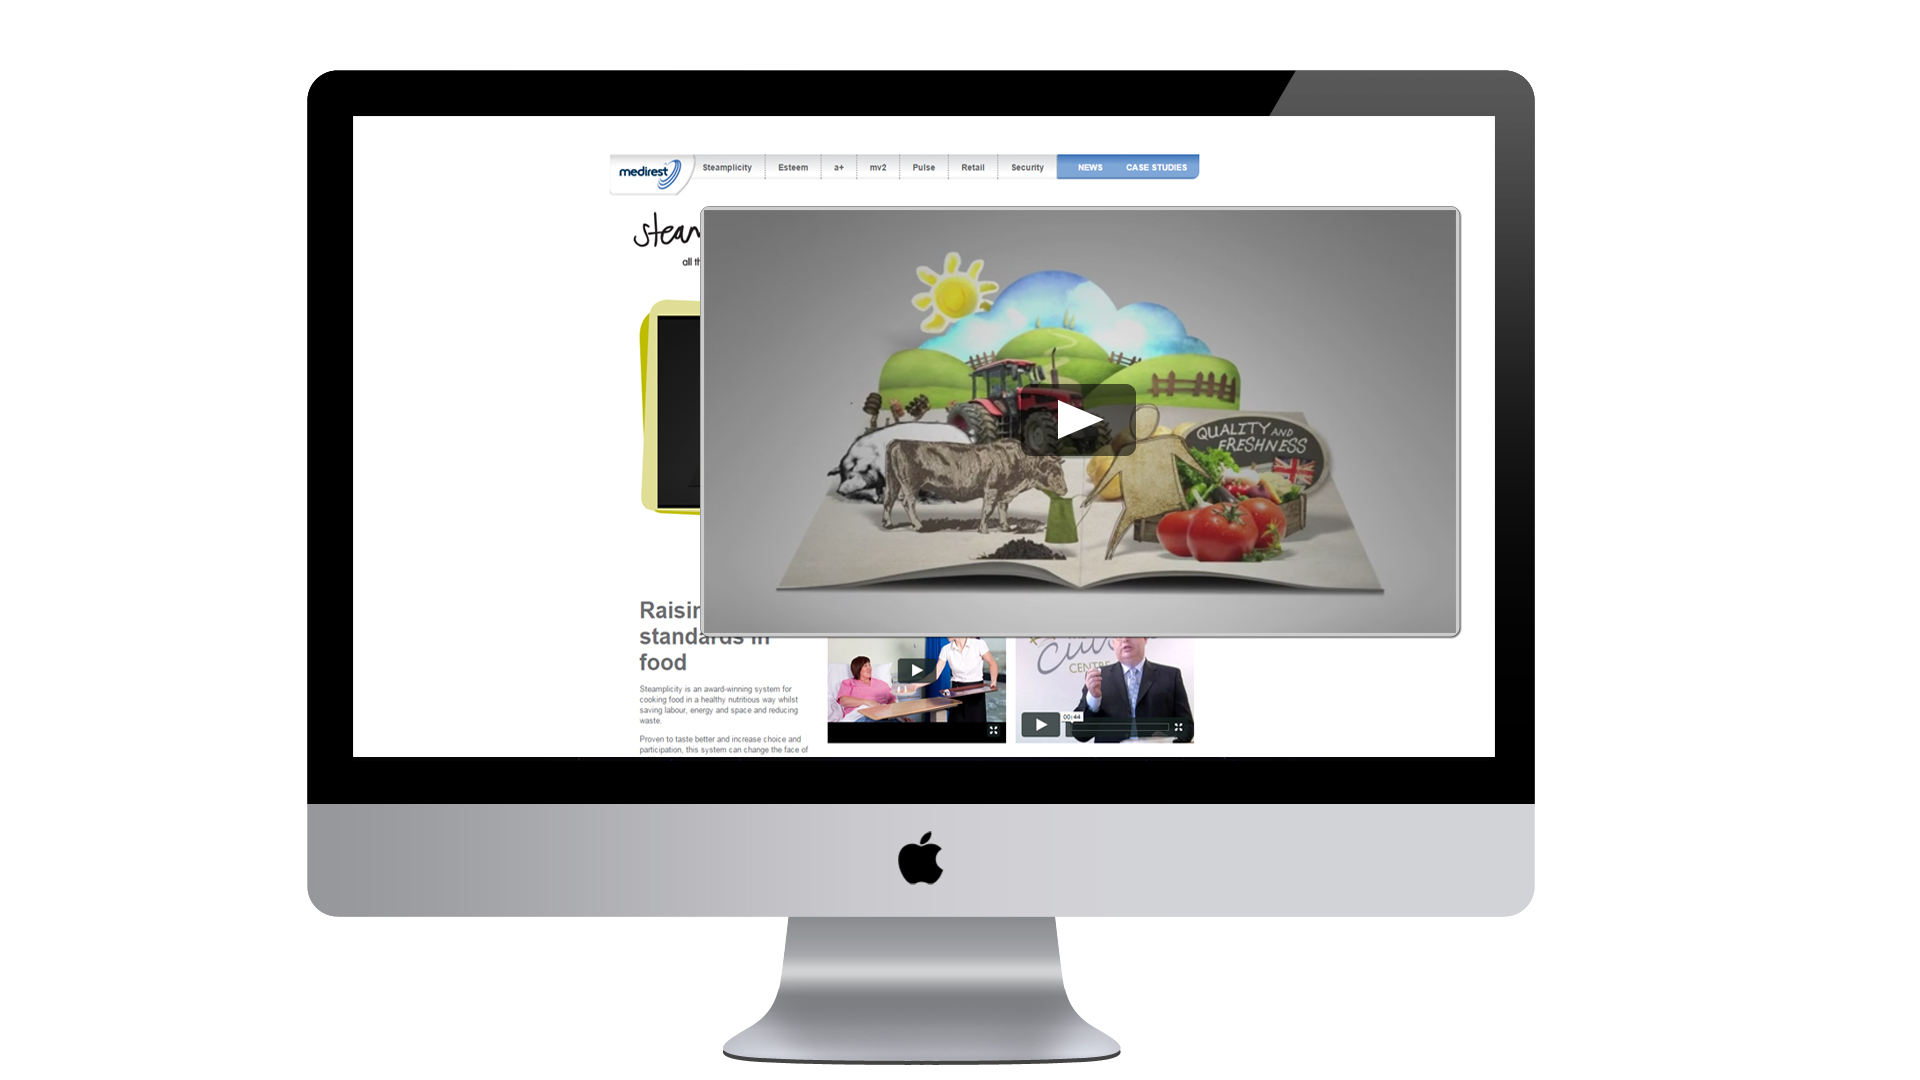 imac_website